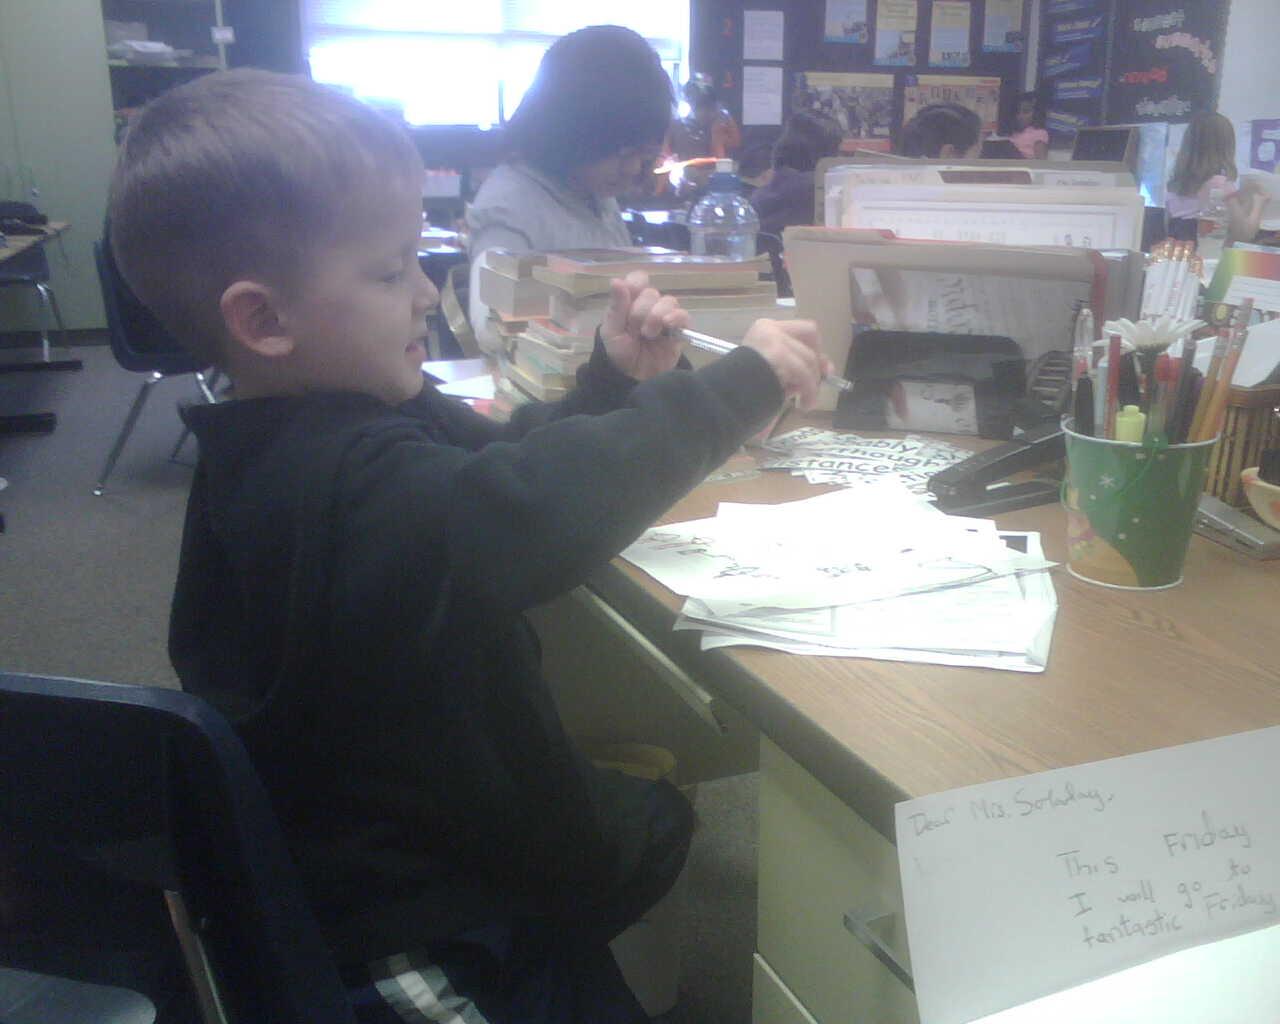 [Carter+in+class]